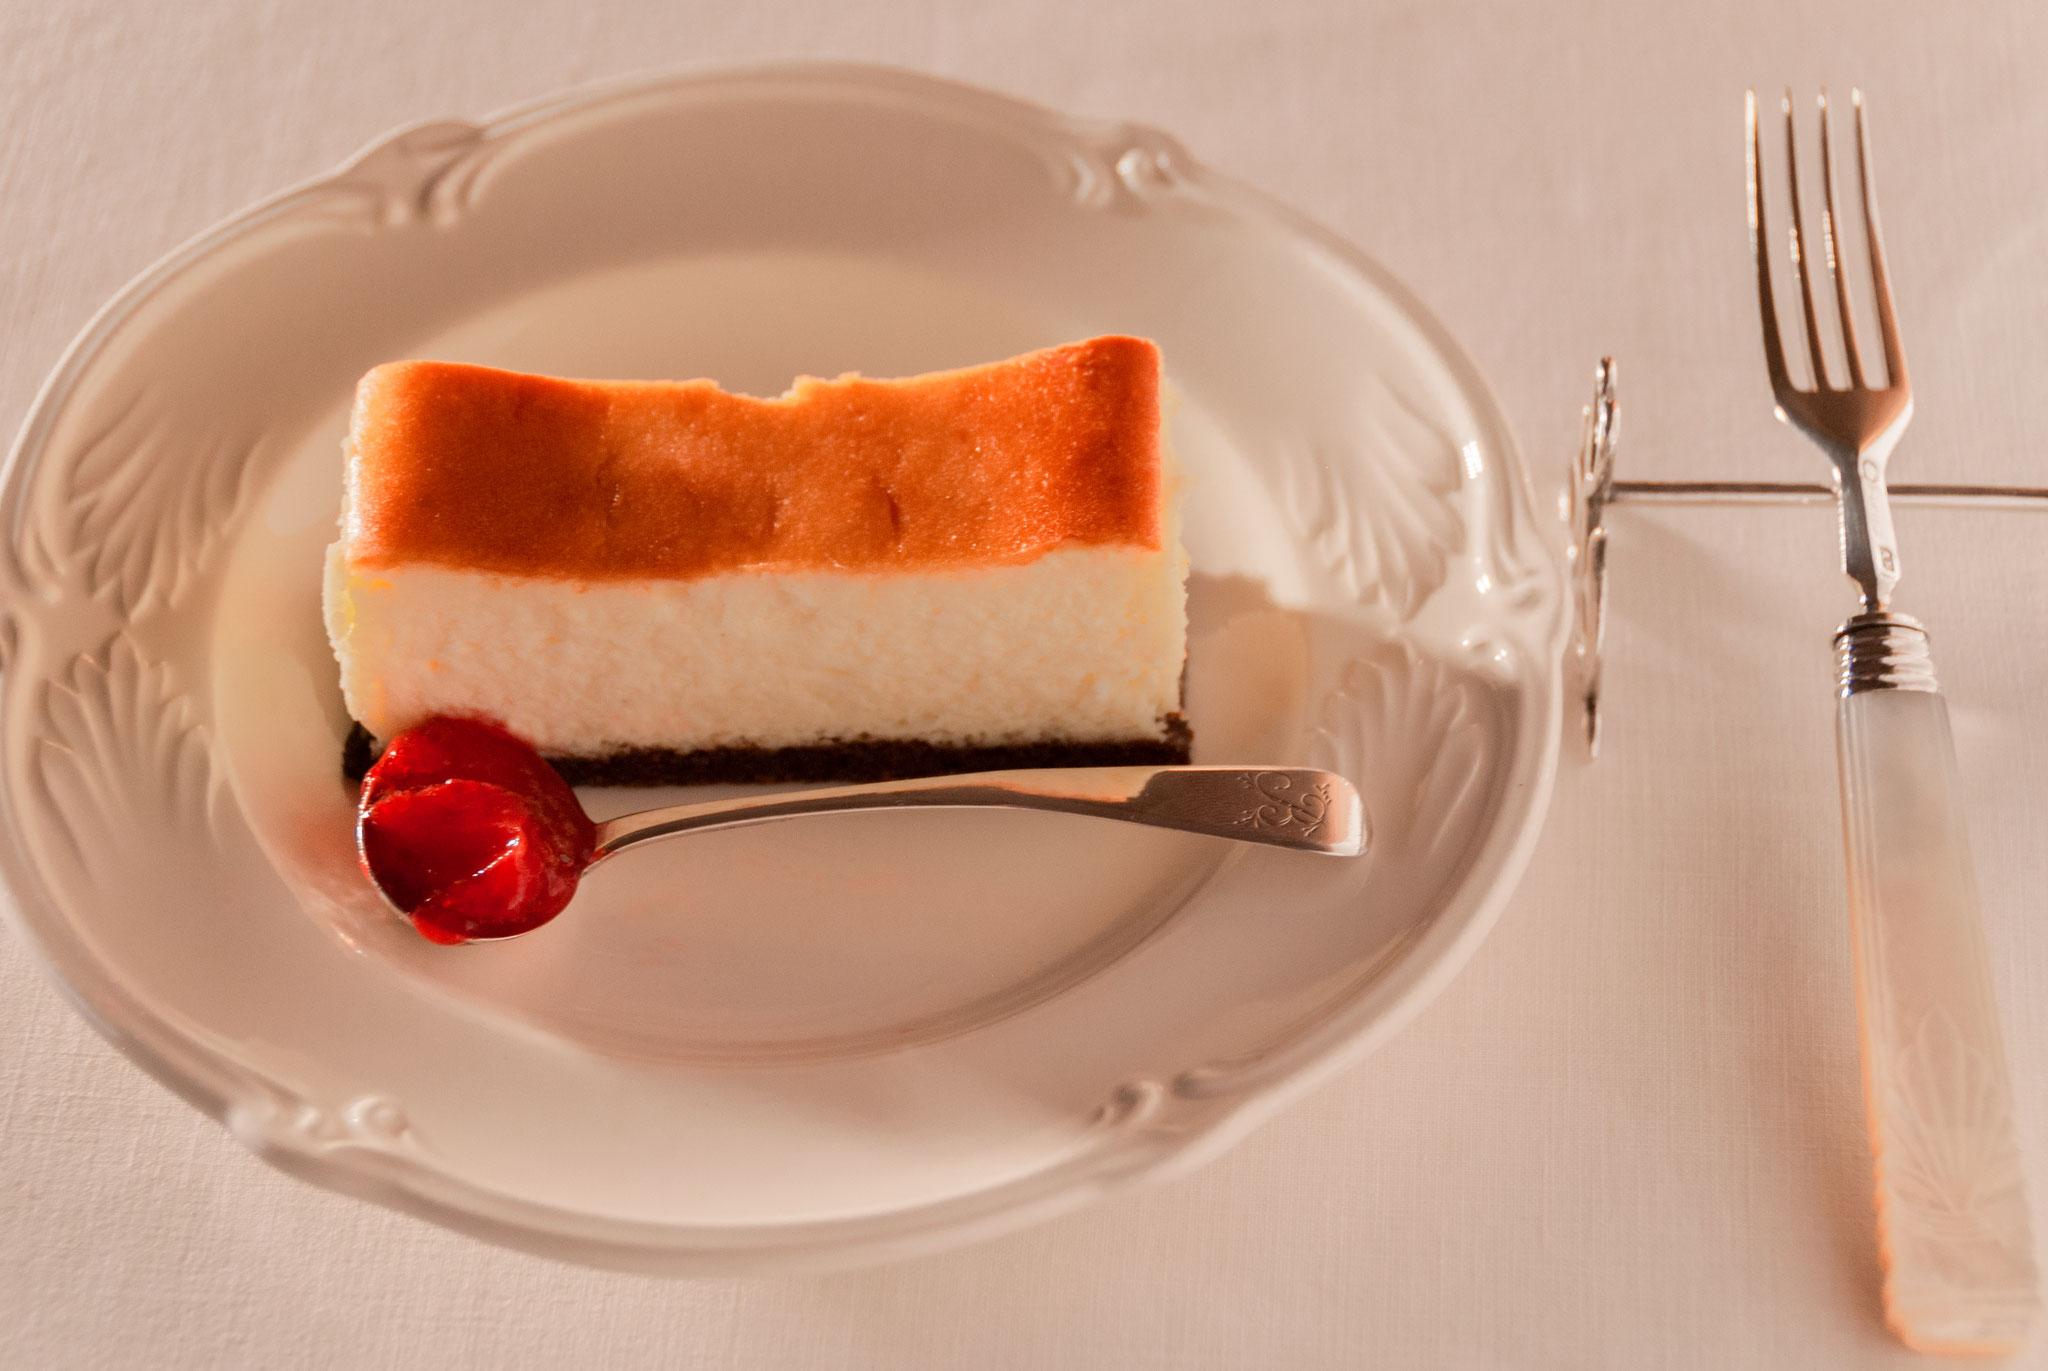 3 New York-Style Cheesecakes, Fleur*Fleur*, fleurfleur